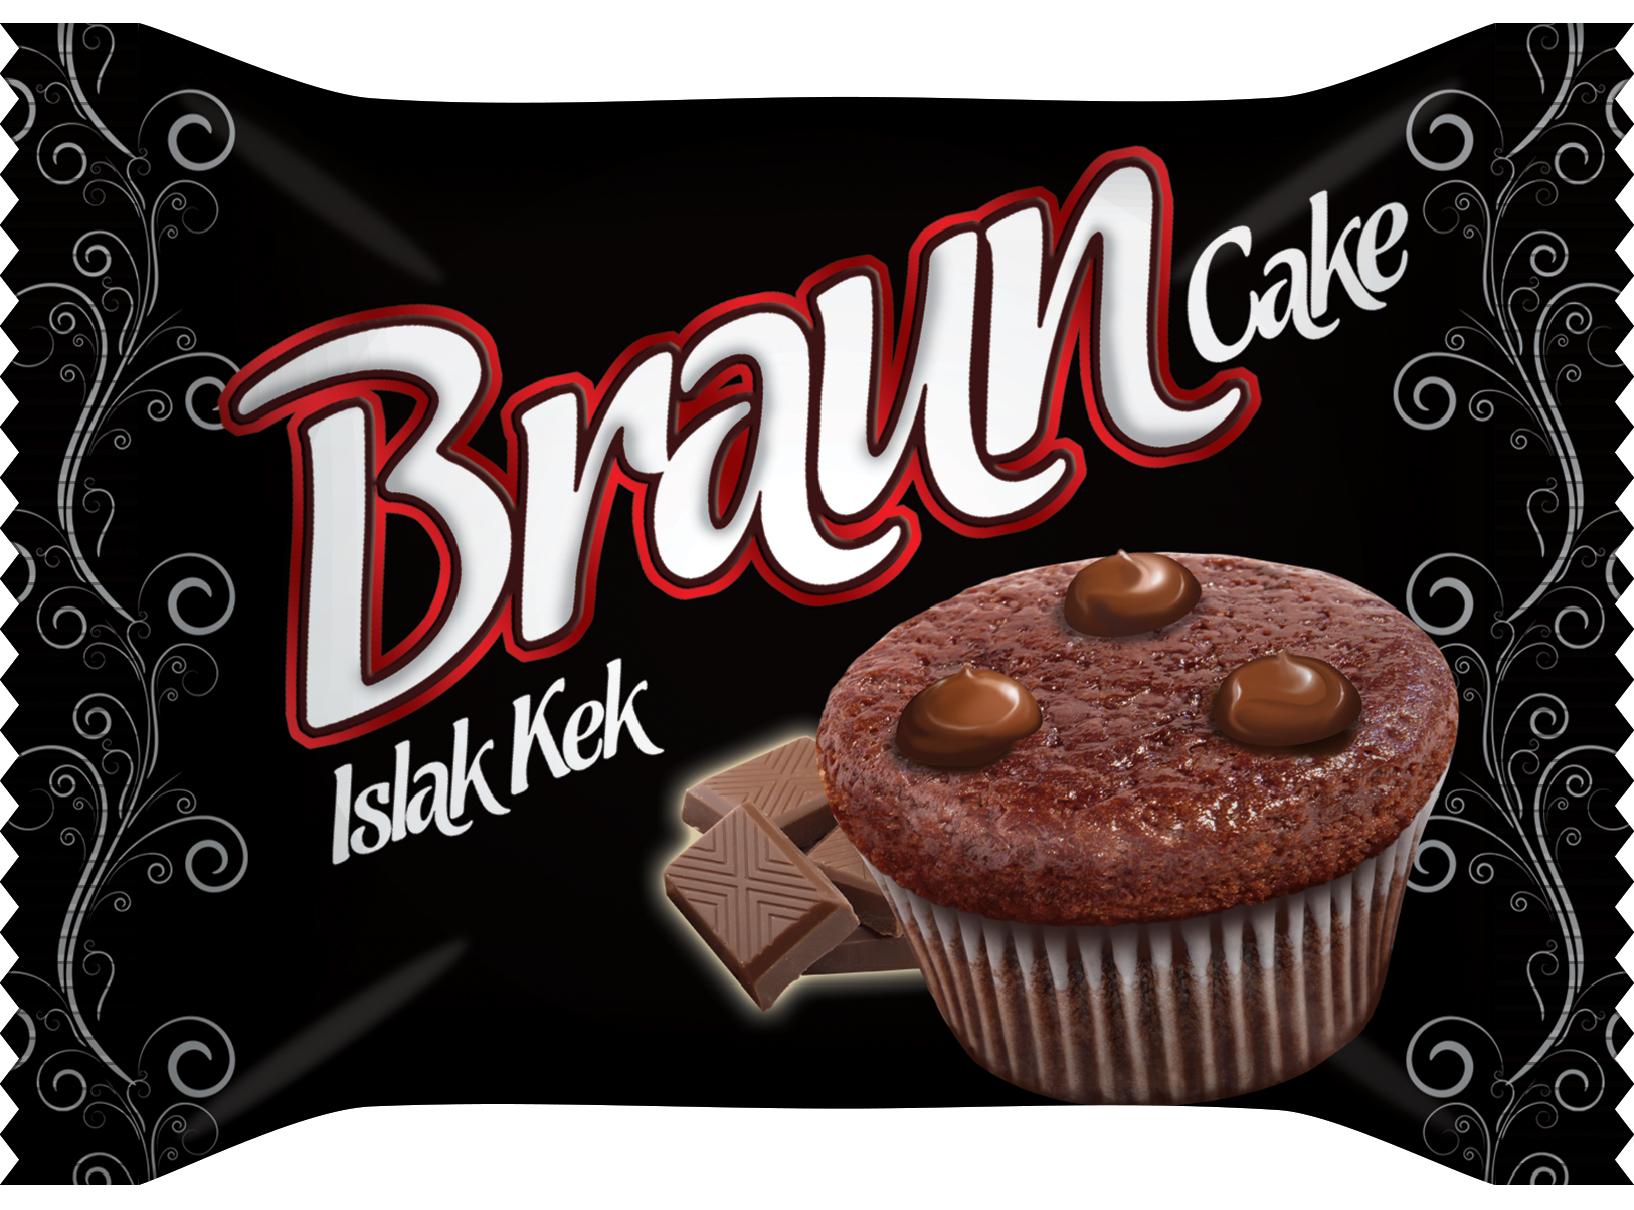 Braun Cake